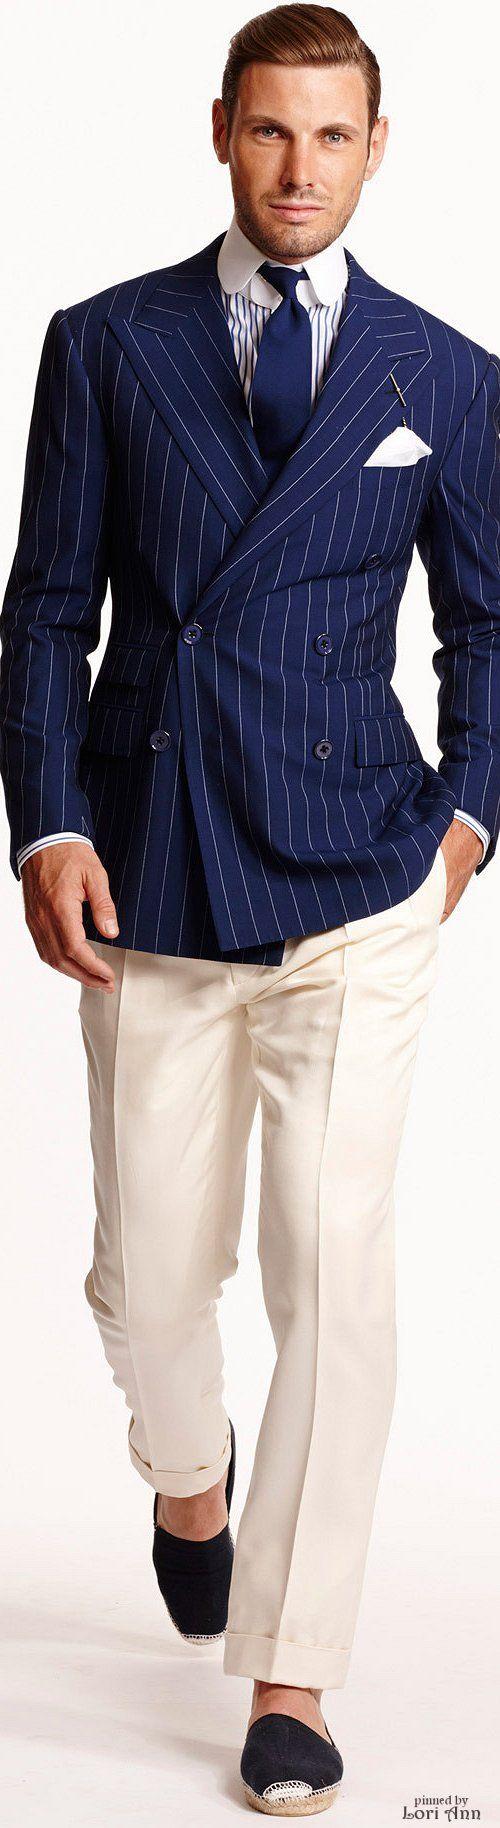 Ralph Lauren #BeigeandBlue Men's Pinstripe Suit Jacket Outfit Spring 2015 Menswear